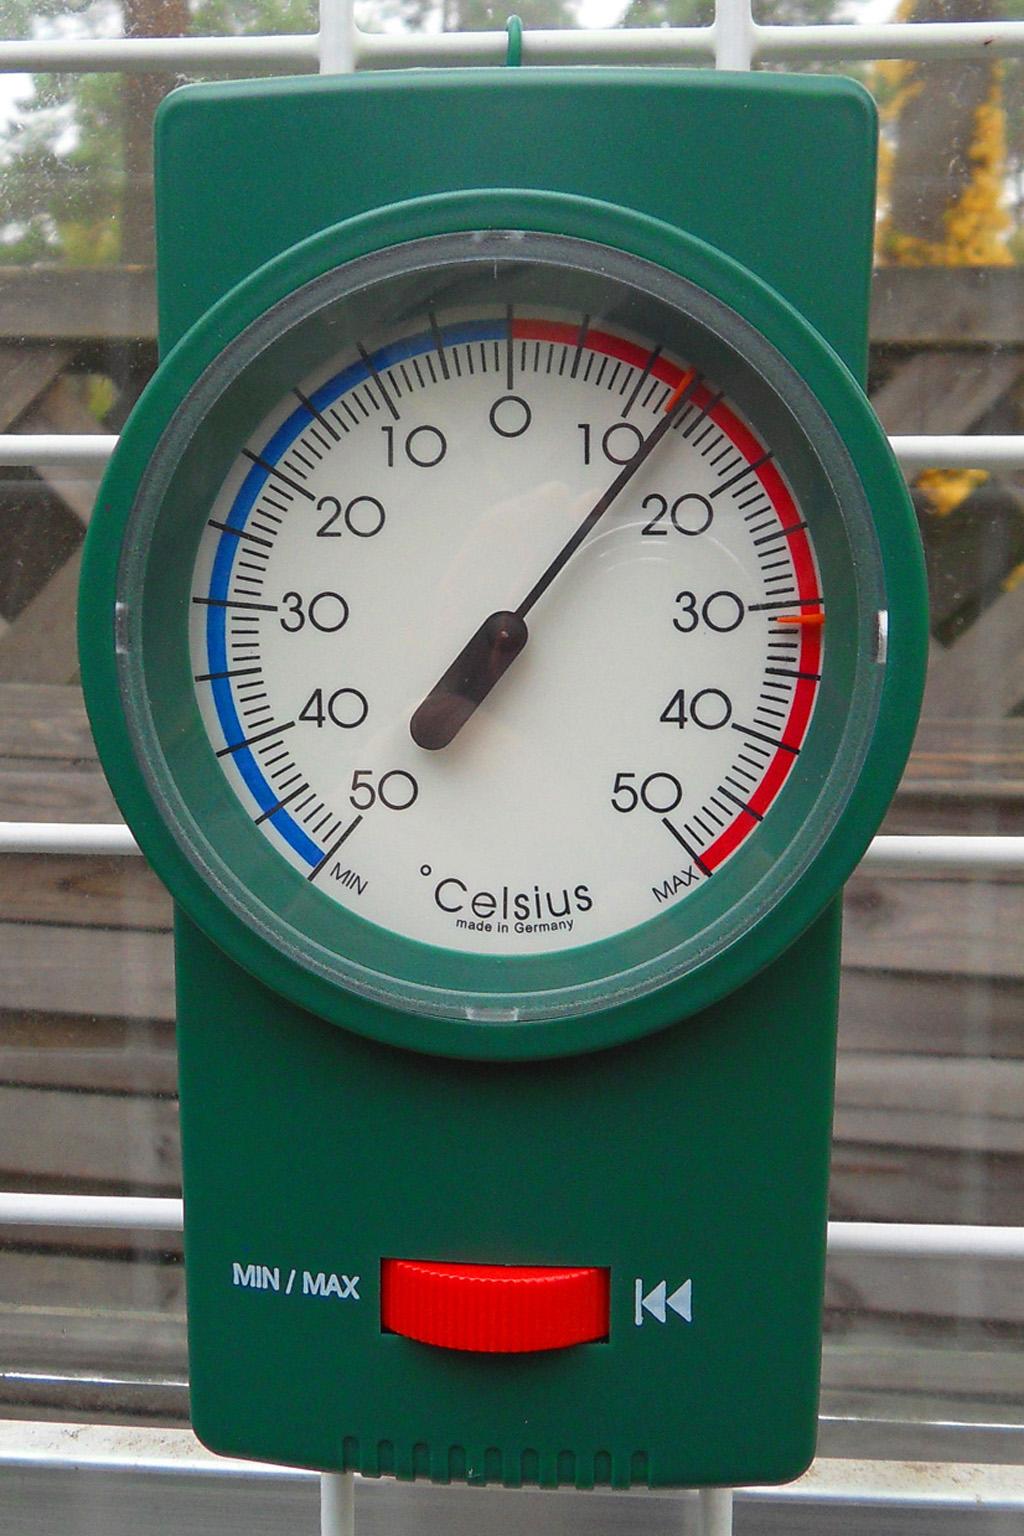 termometer_min_max_vaxthus_1024x1536.jpg